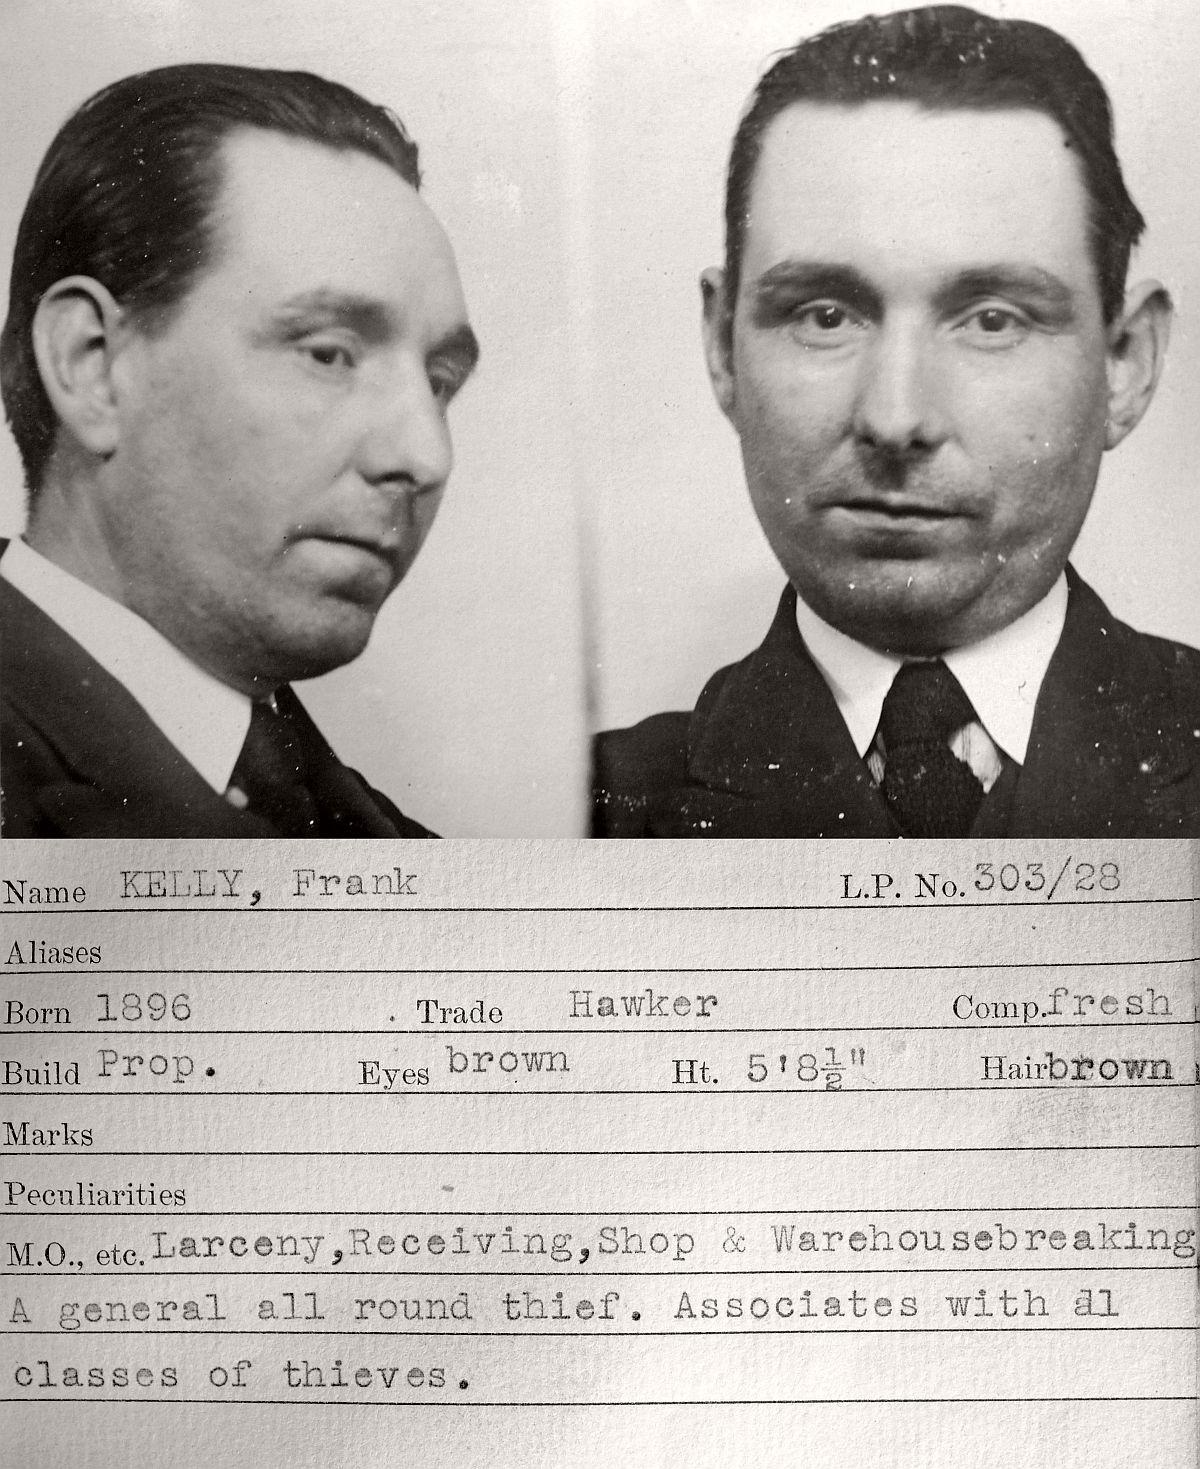 vintage-mug-shot-of-criminals-from-newcastle-upon-tyne-1930s-03